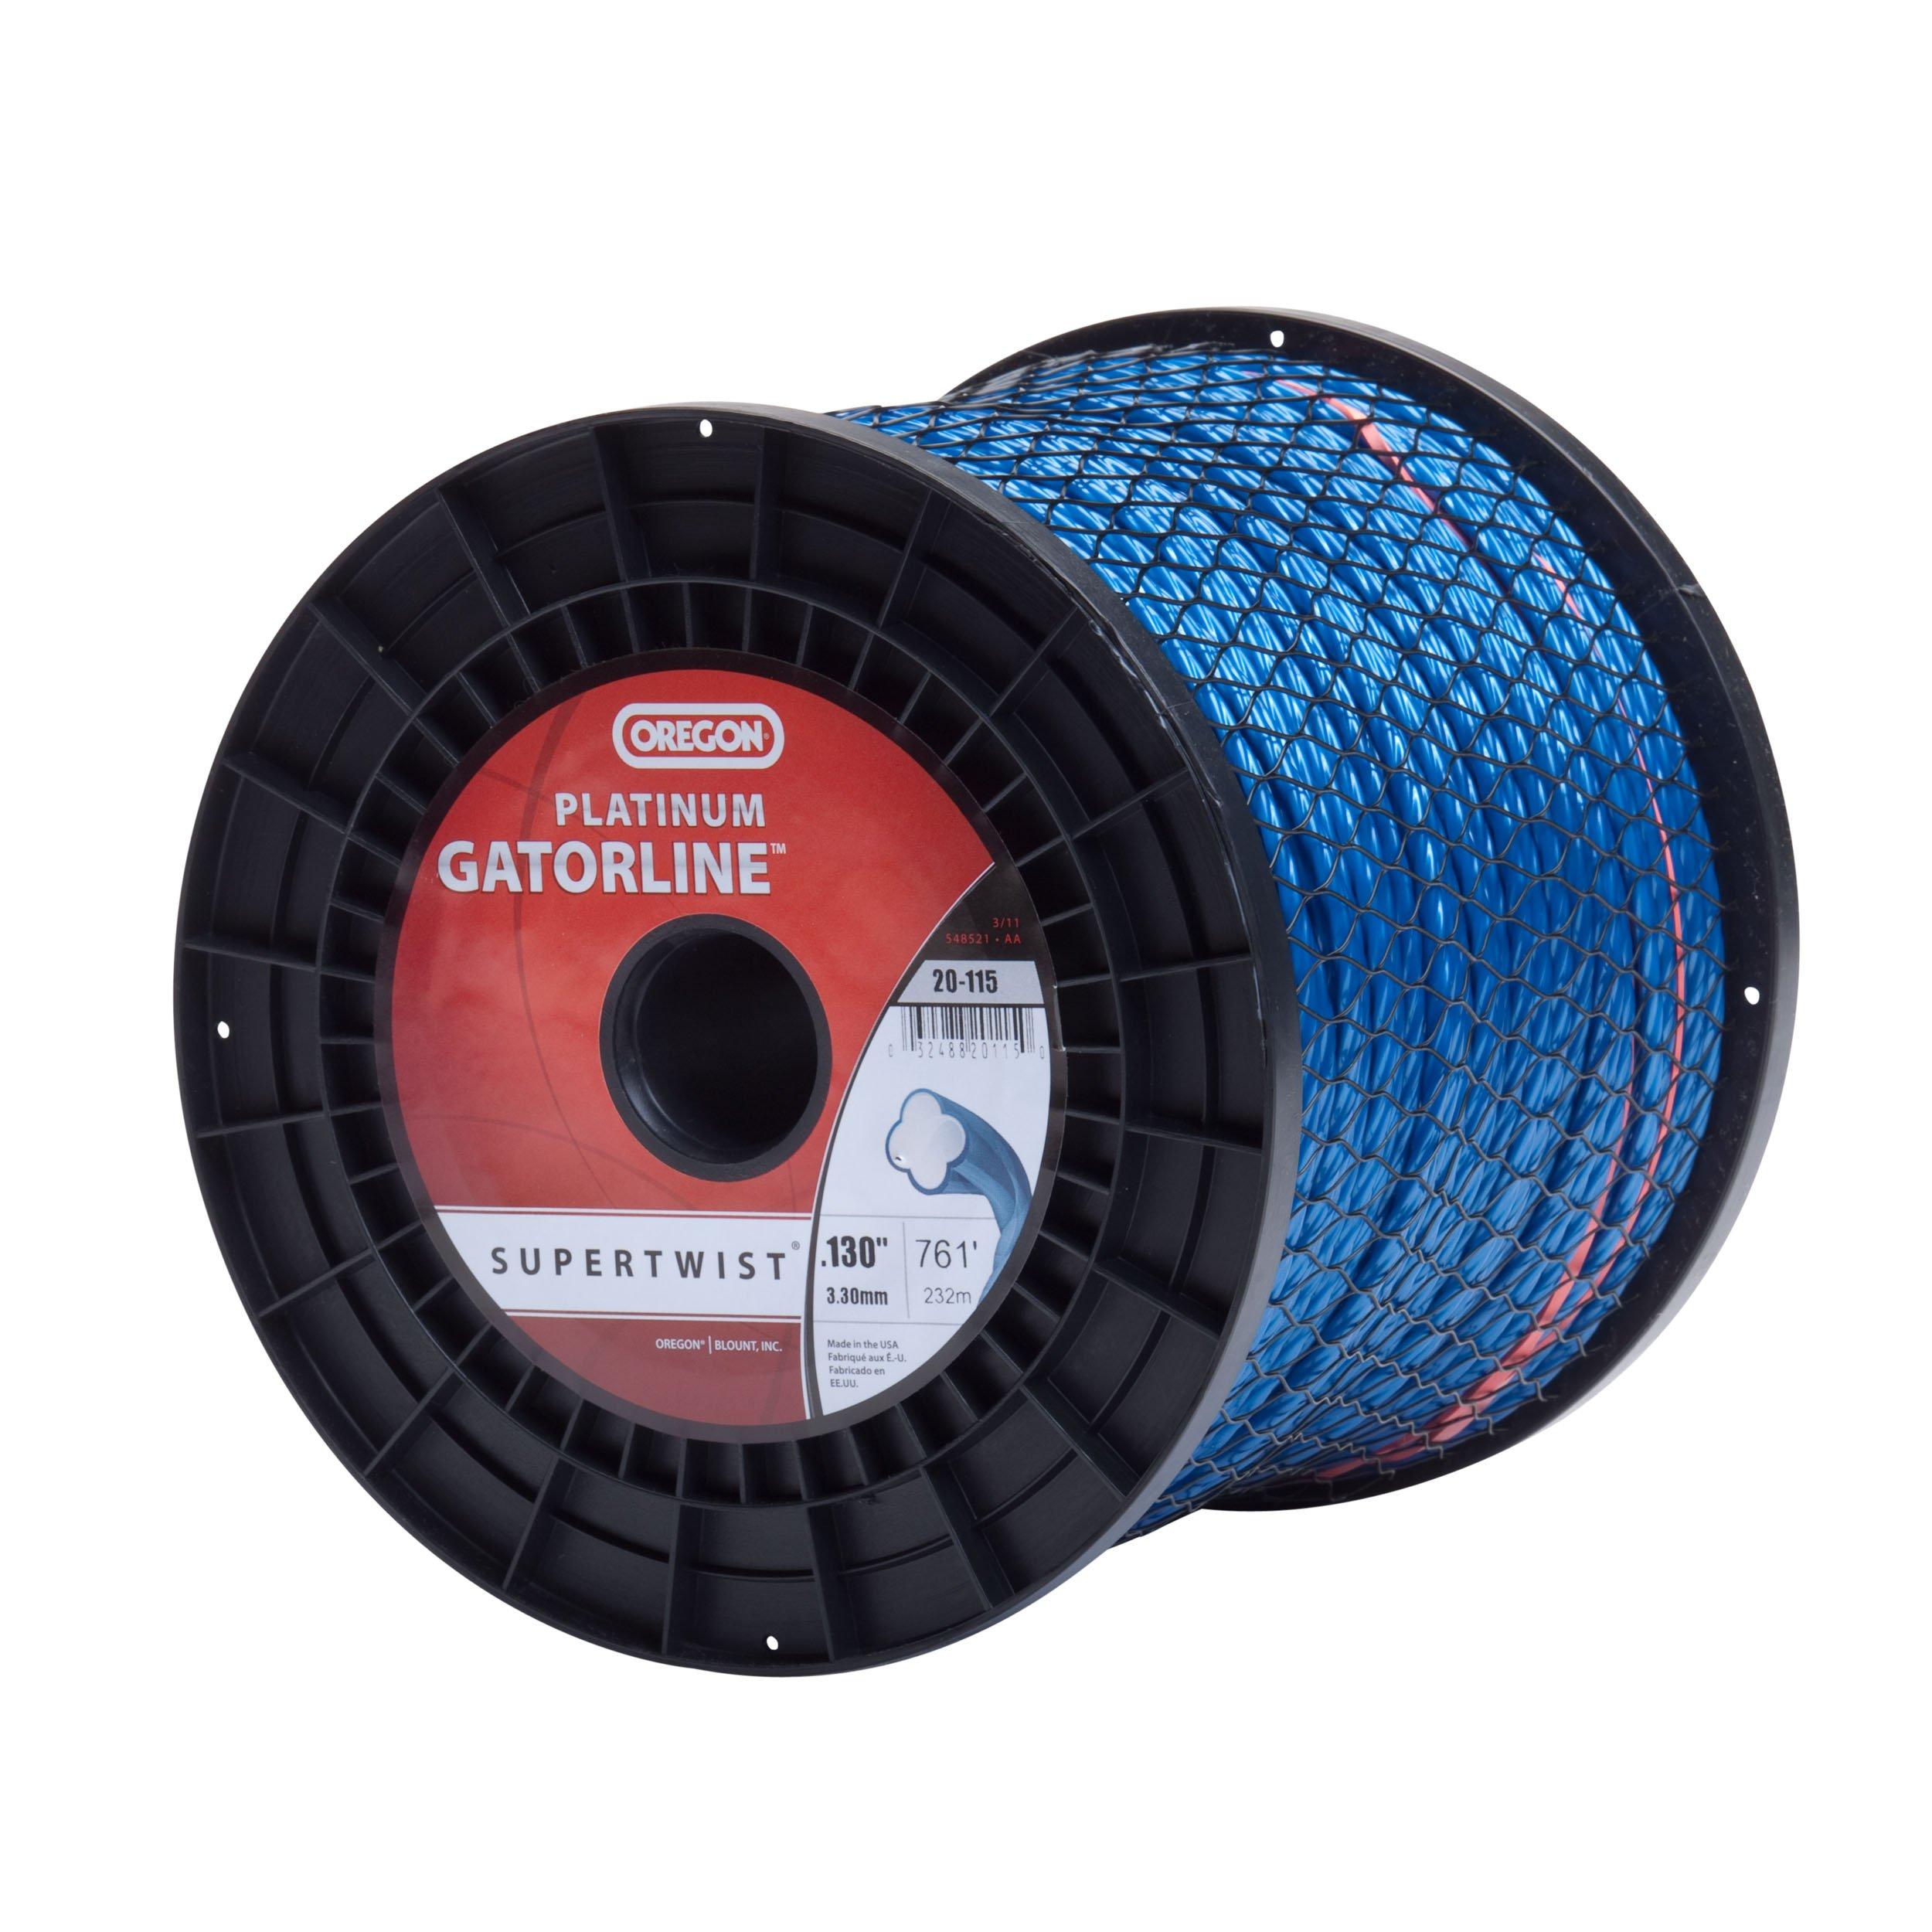 Oregon 20-115 Platinum Gatorline 5-Pound Spool String Trimmer Line 0.130-Inch Gauge